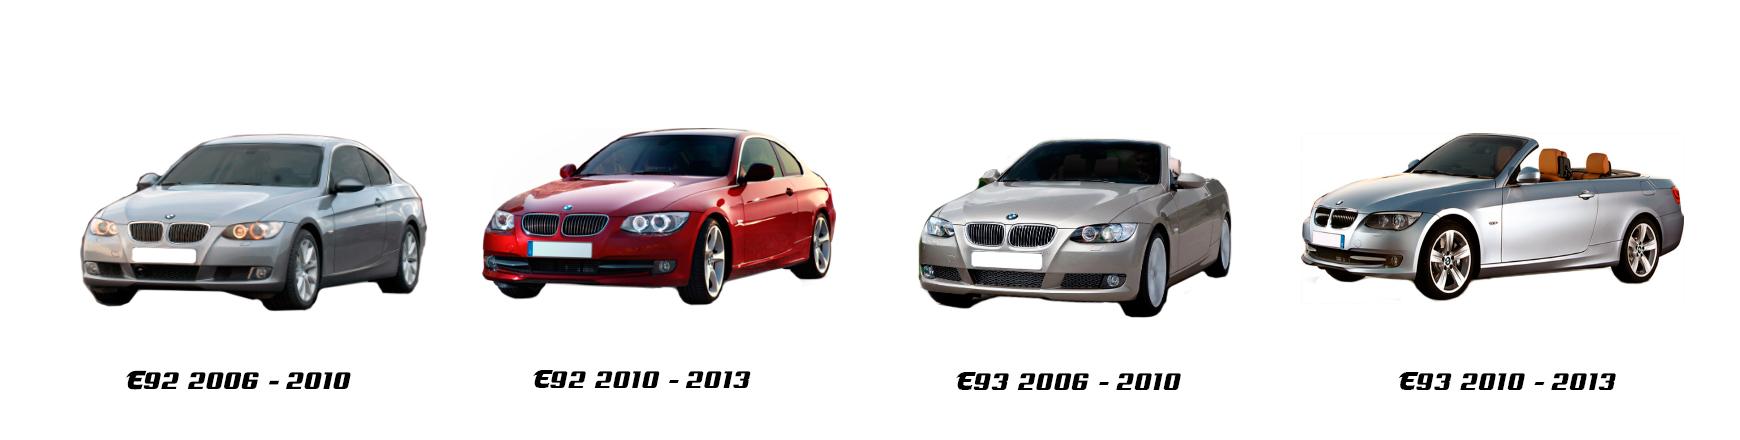 bmw serie 3 e92 coupe 2005 2006 2007 2008 2009 2010 2011 2012 2013